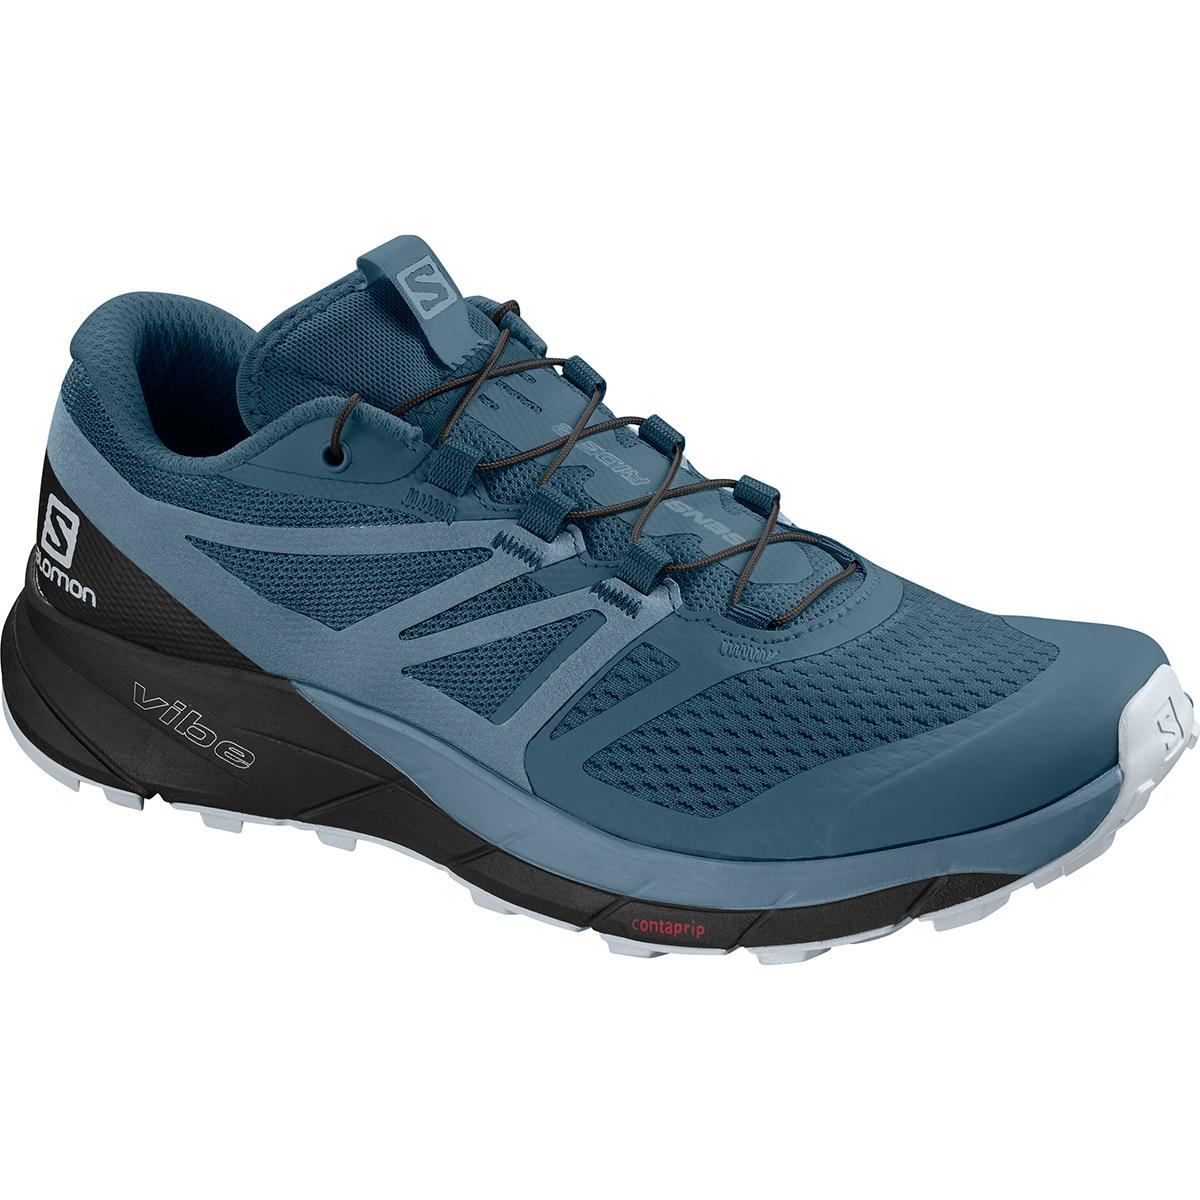 Salomon Women's Sense Ride 2 Trail Running Shoes - Blue, 10